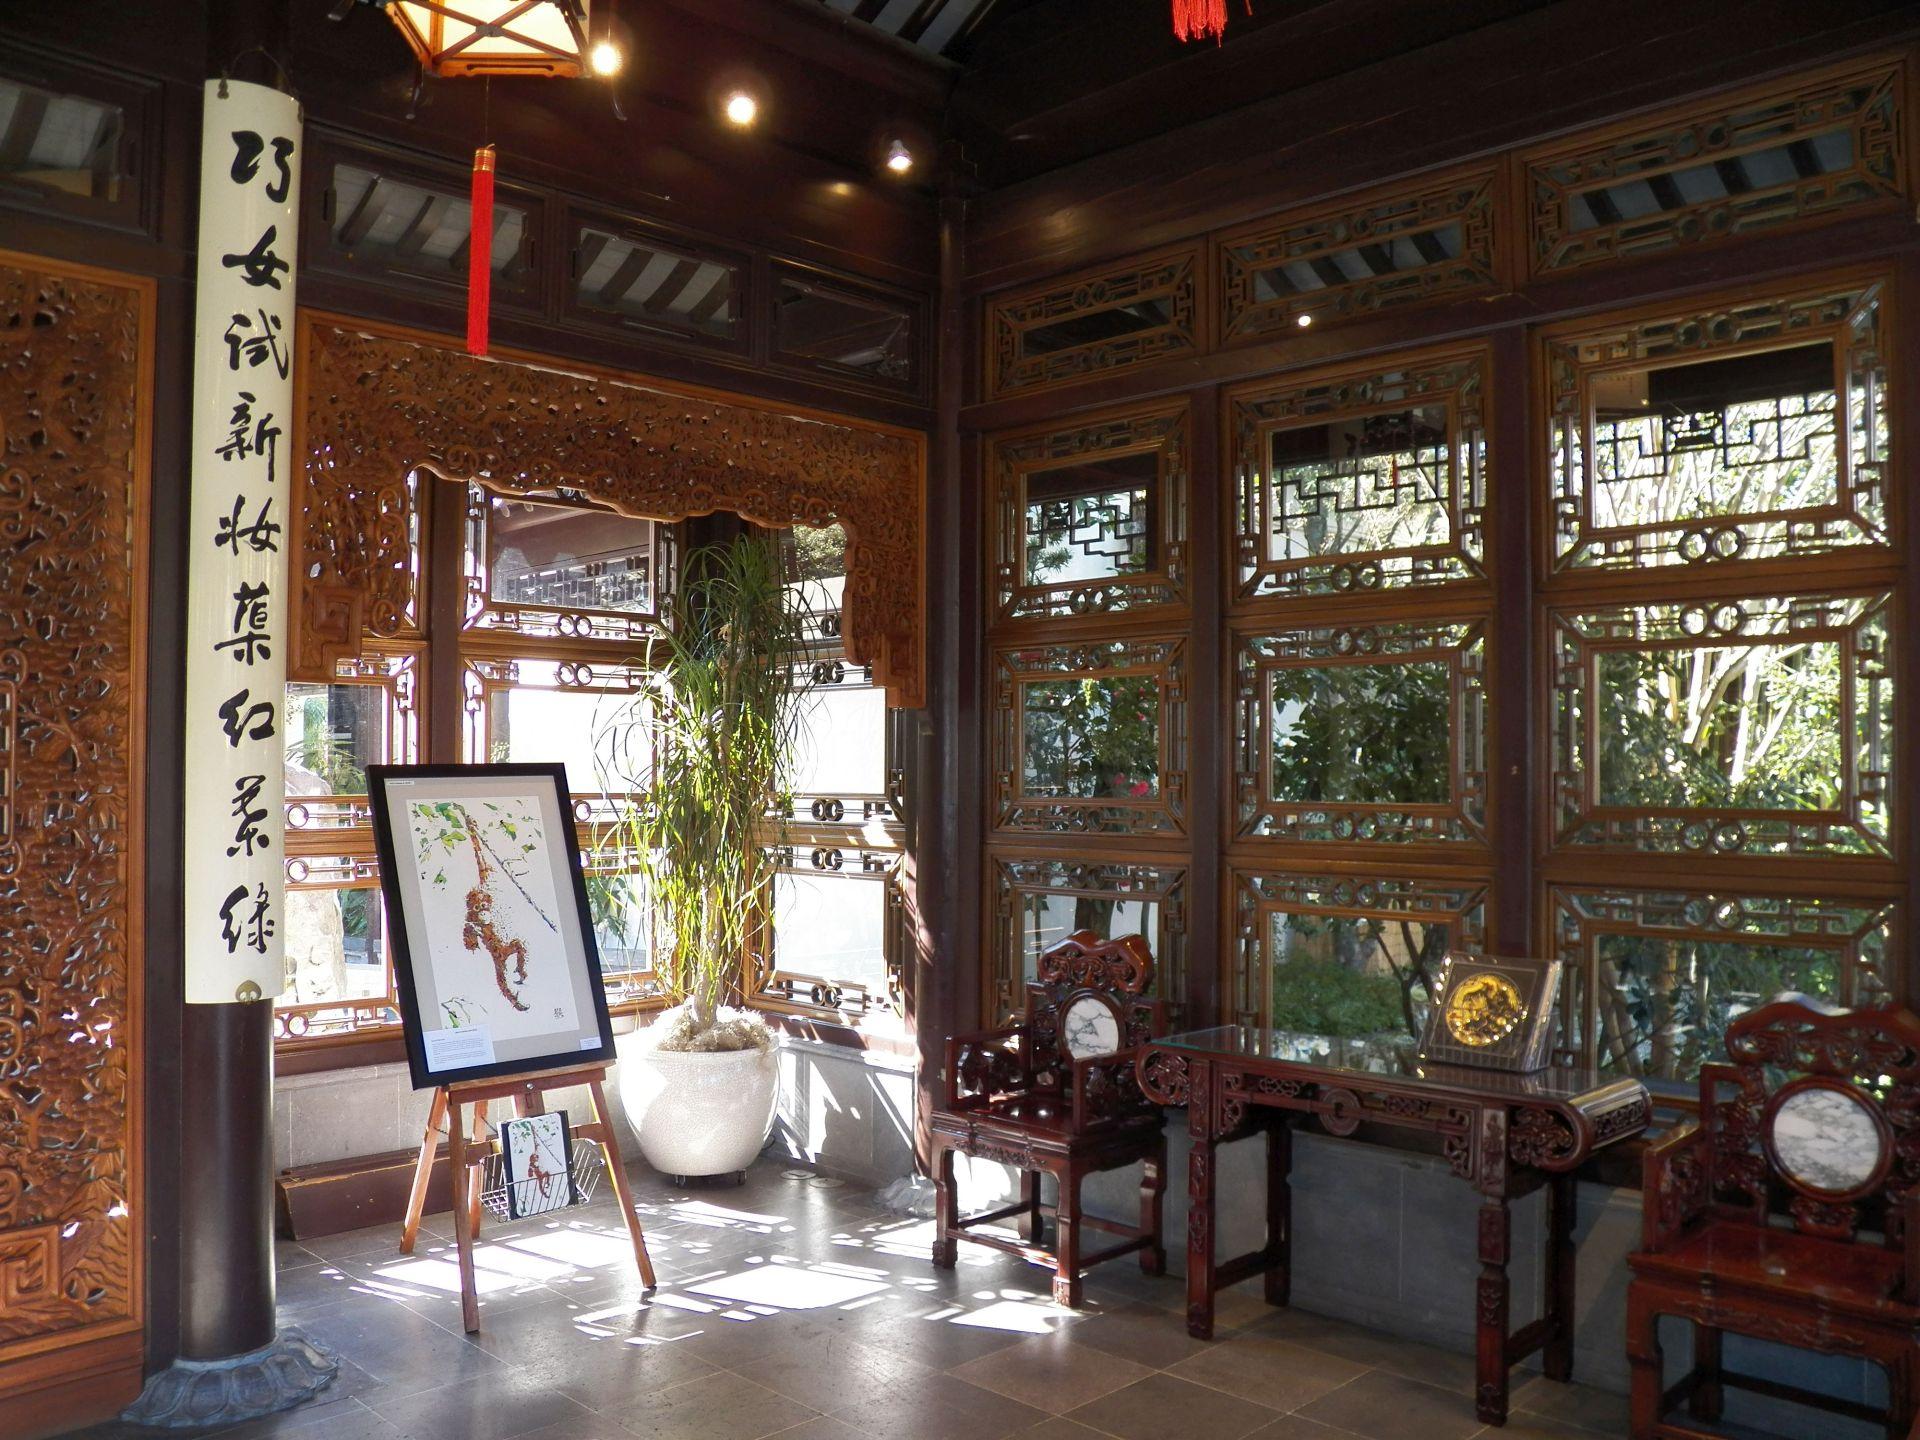 Springtime in a Classical Chinese Garden   northwestphotos